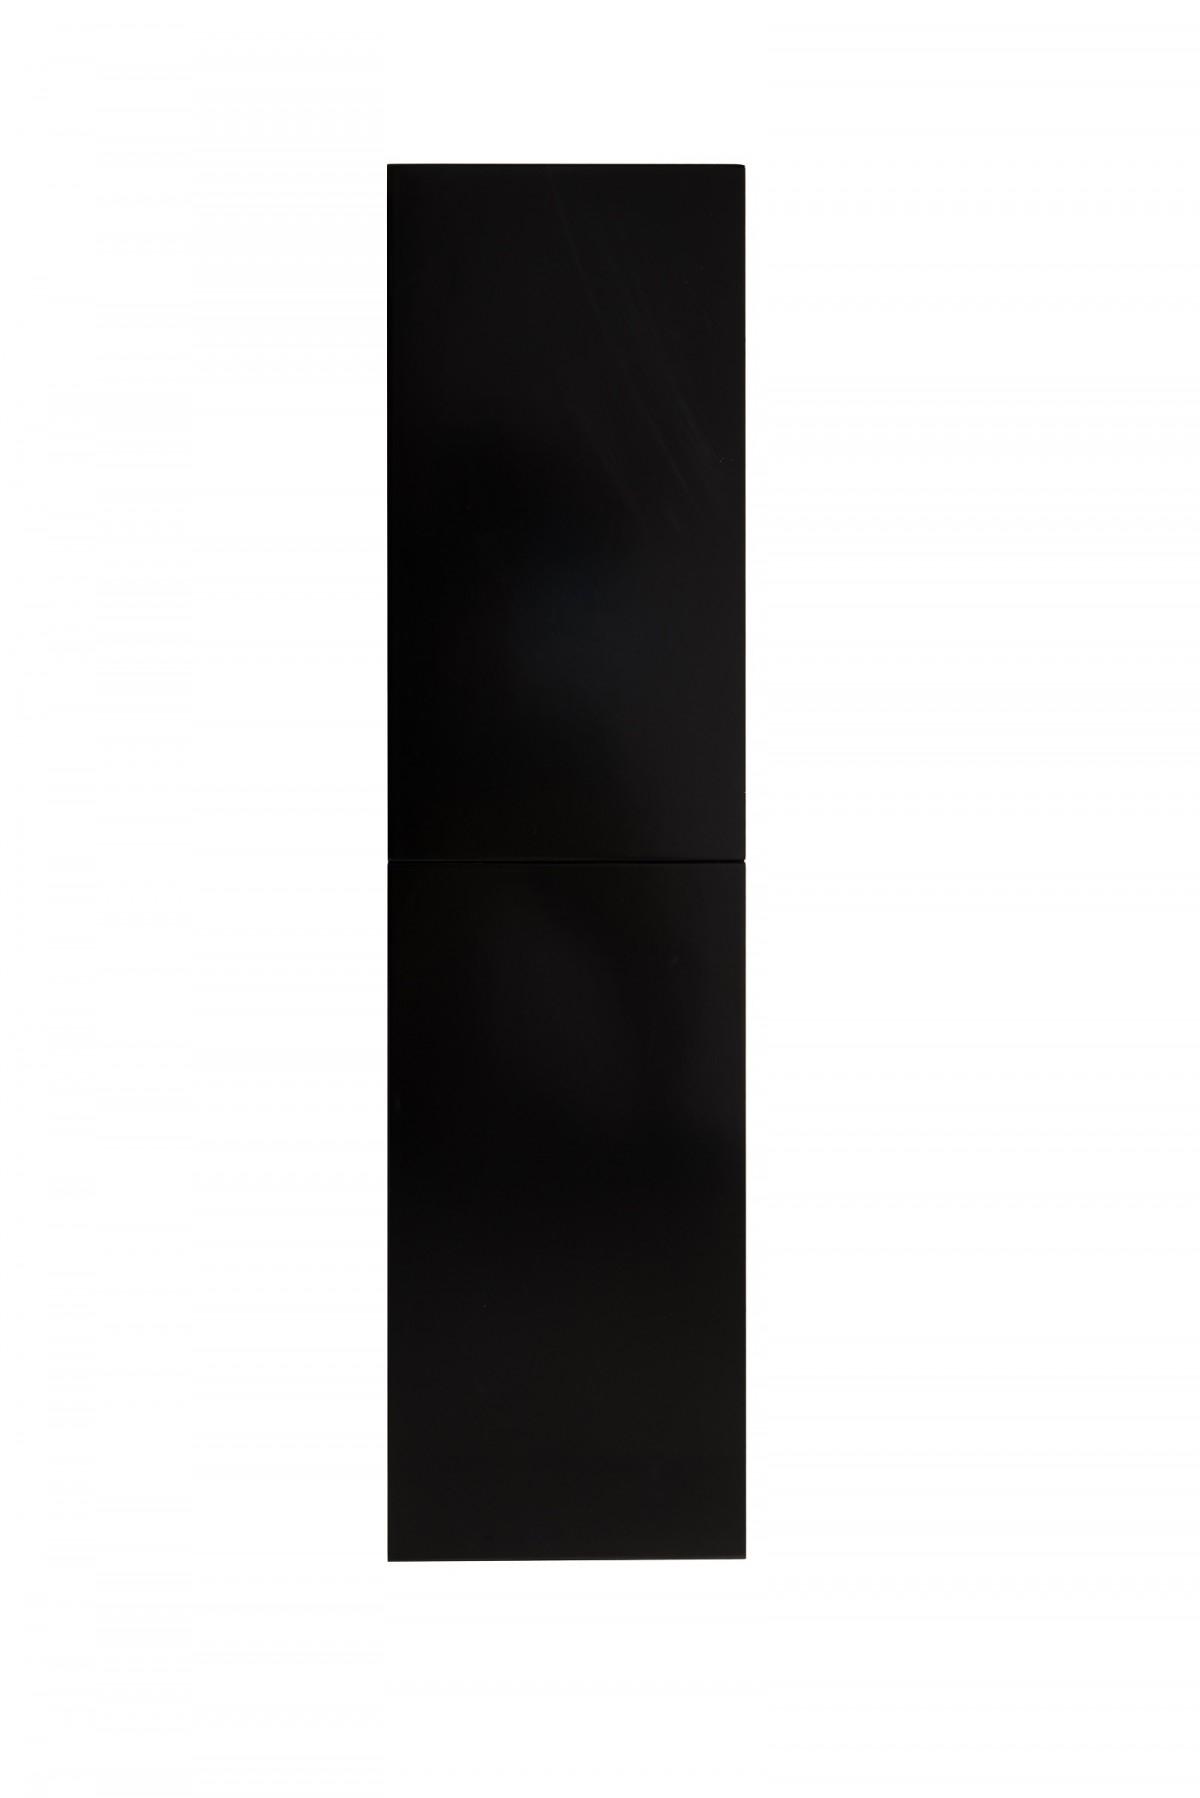 SaniGoods Giant kolomkast 140x35cm hoogglans zwart